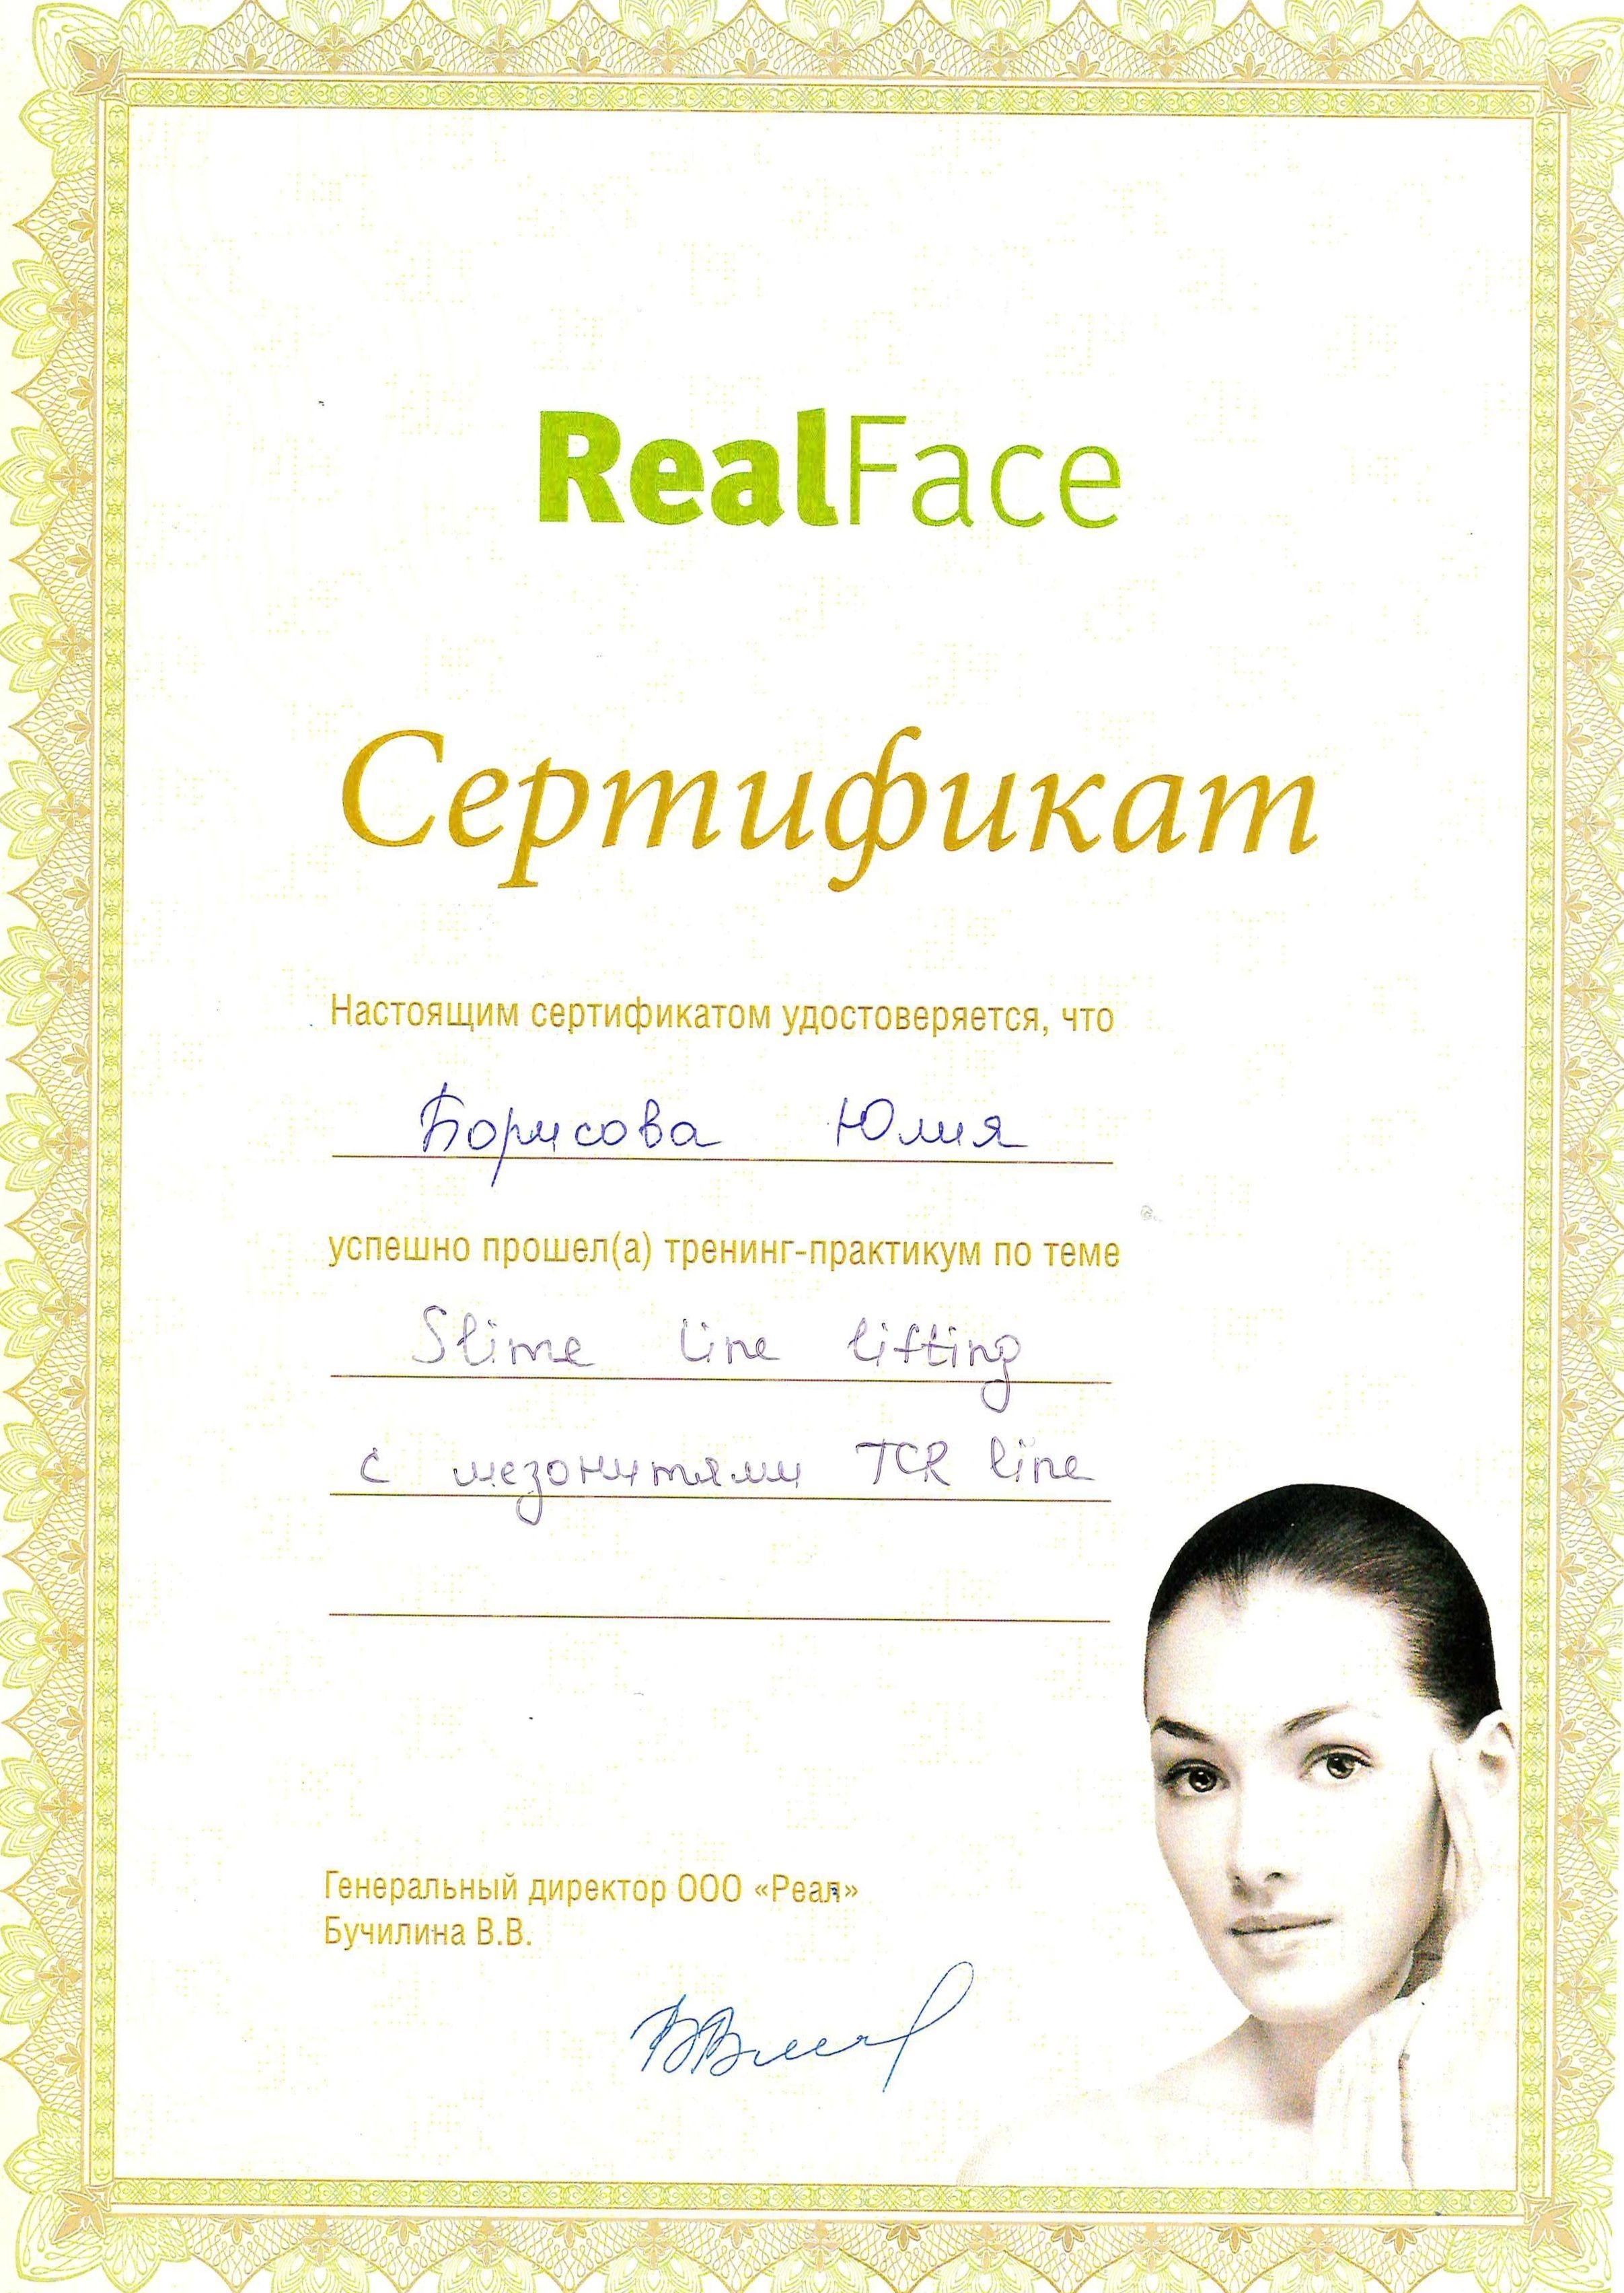 Сертификат — Тренинг-практикум Slime line lifting с мезонитями TCR line. Григорьева Юлия Ростиславовна